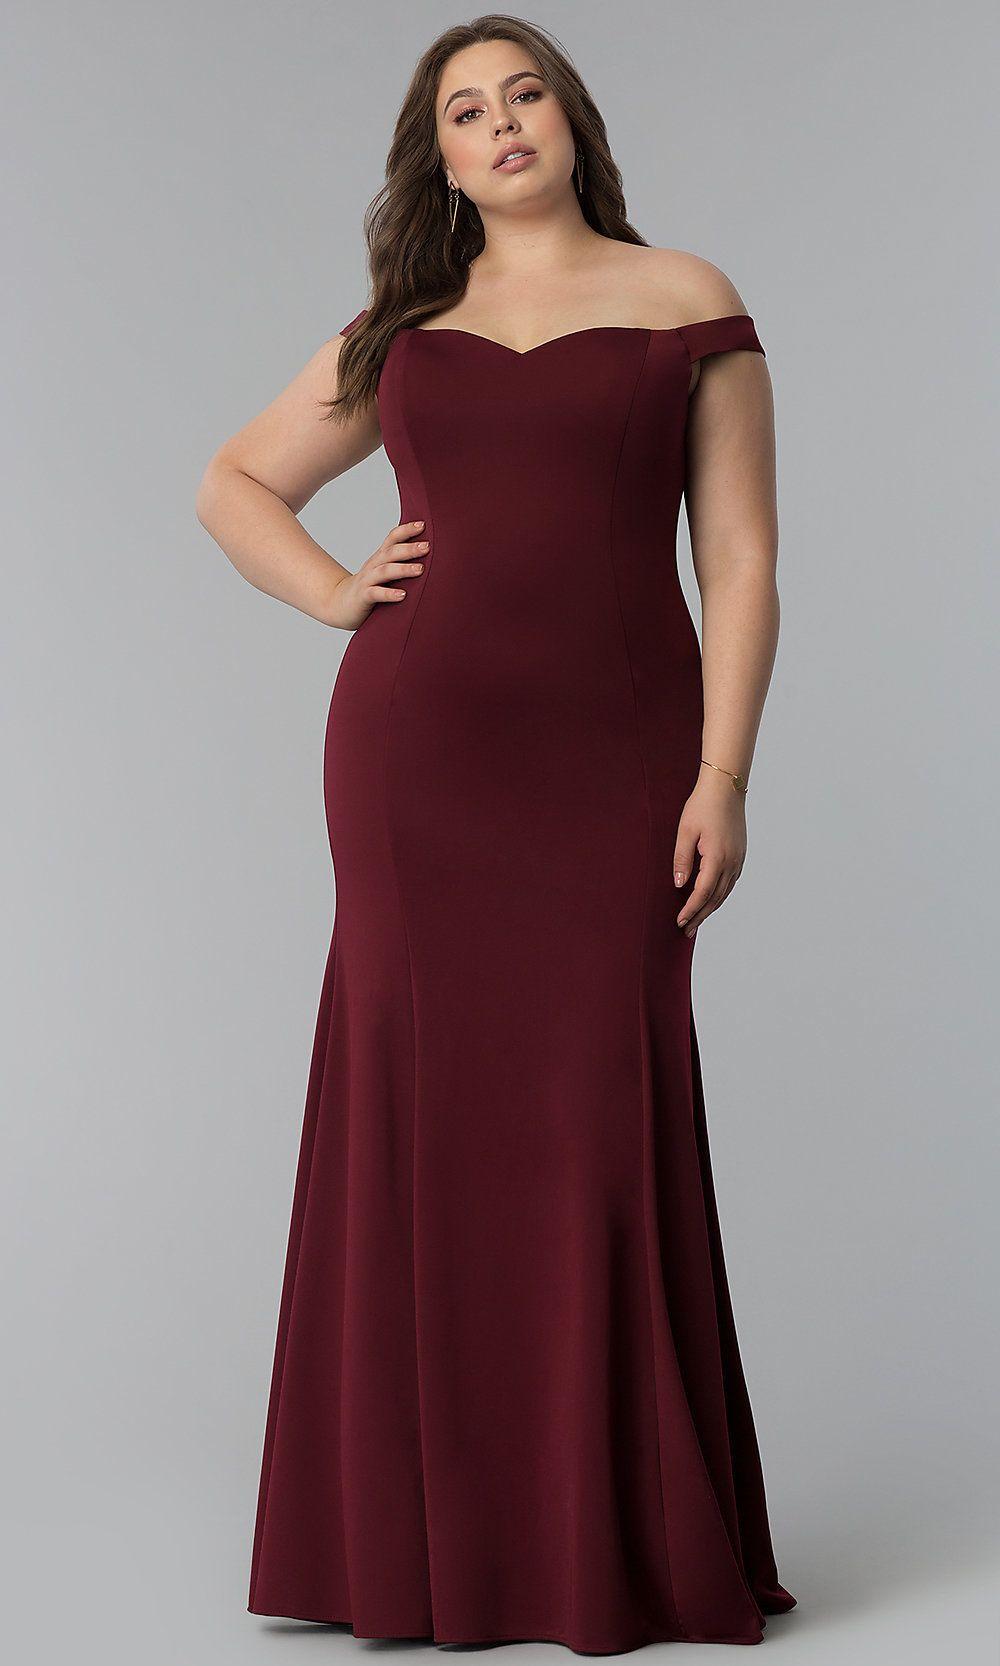 1adaece845e Long Plus-Size Off-the-Shoulder Sweetheart Prom Dress